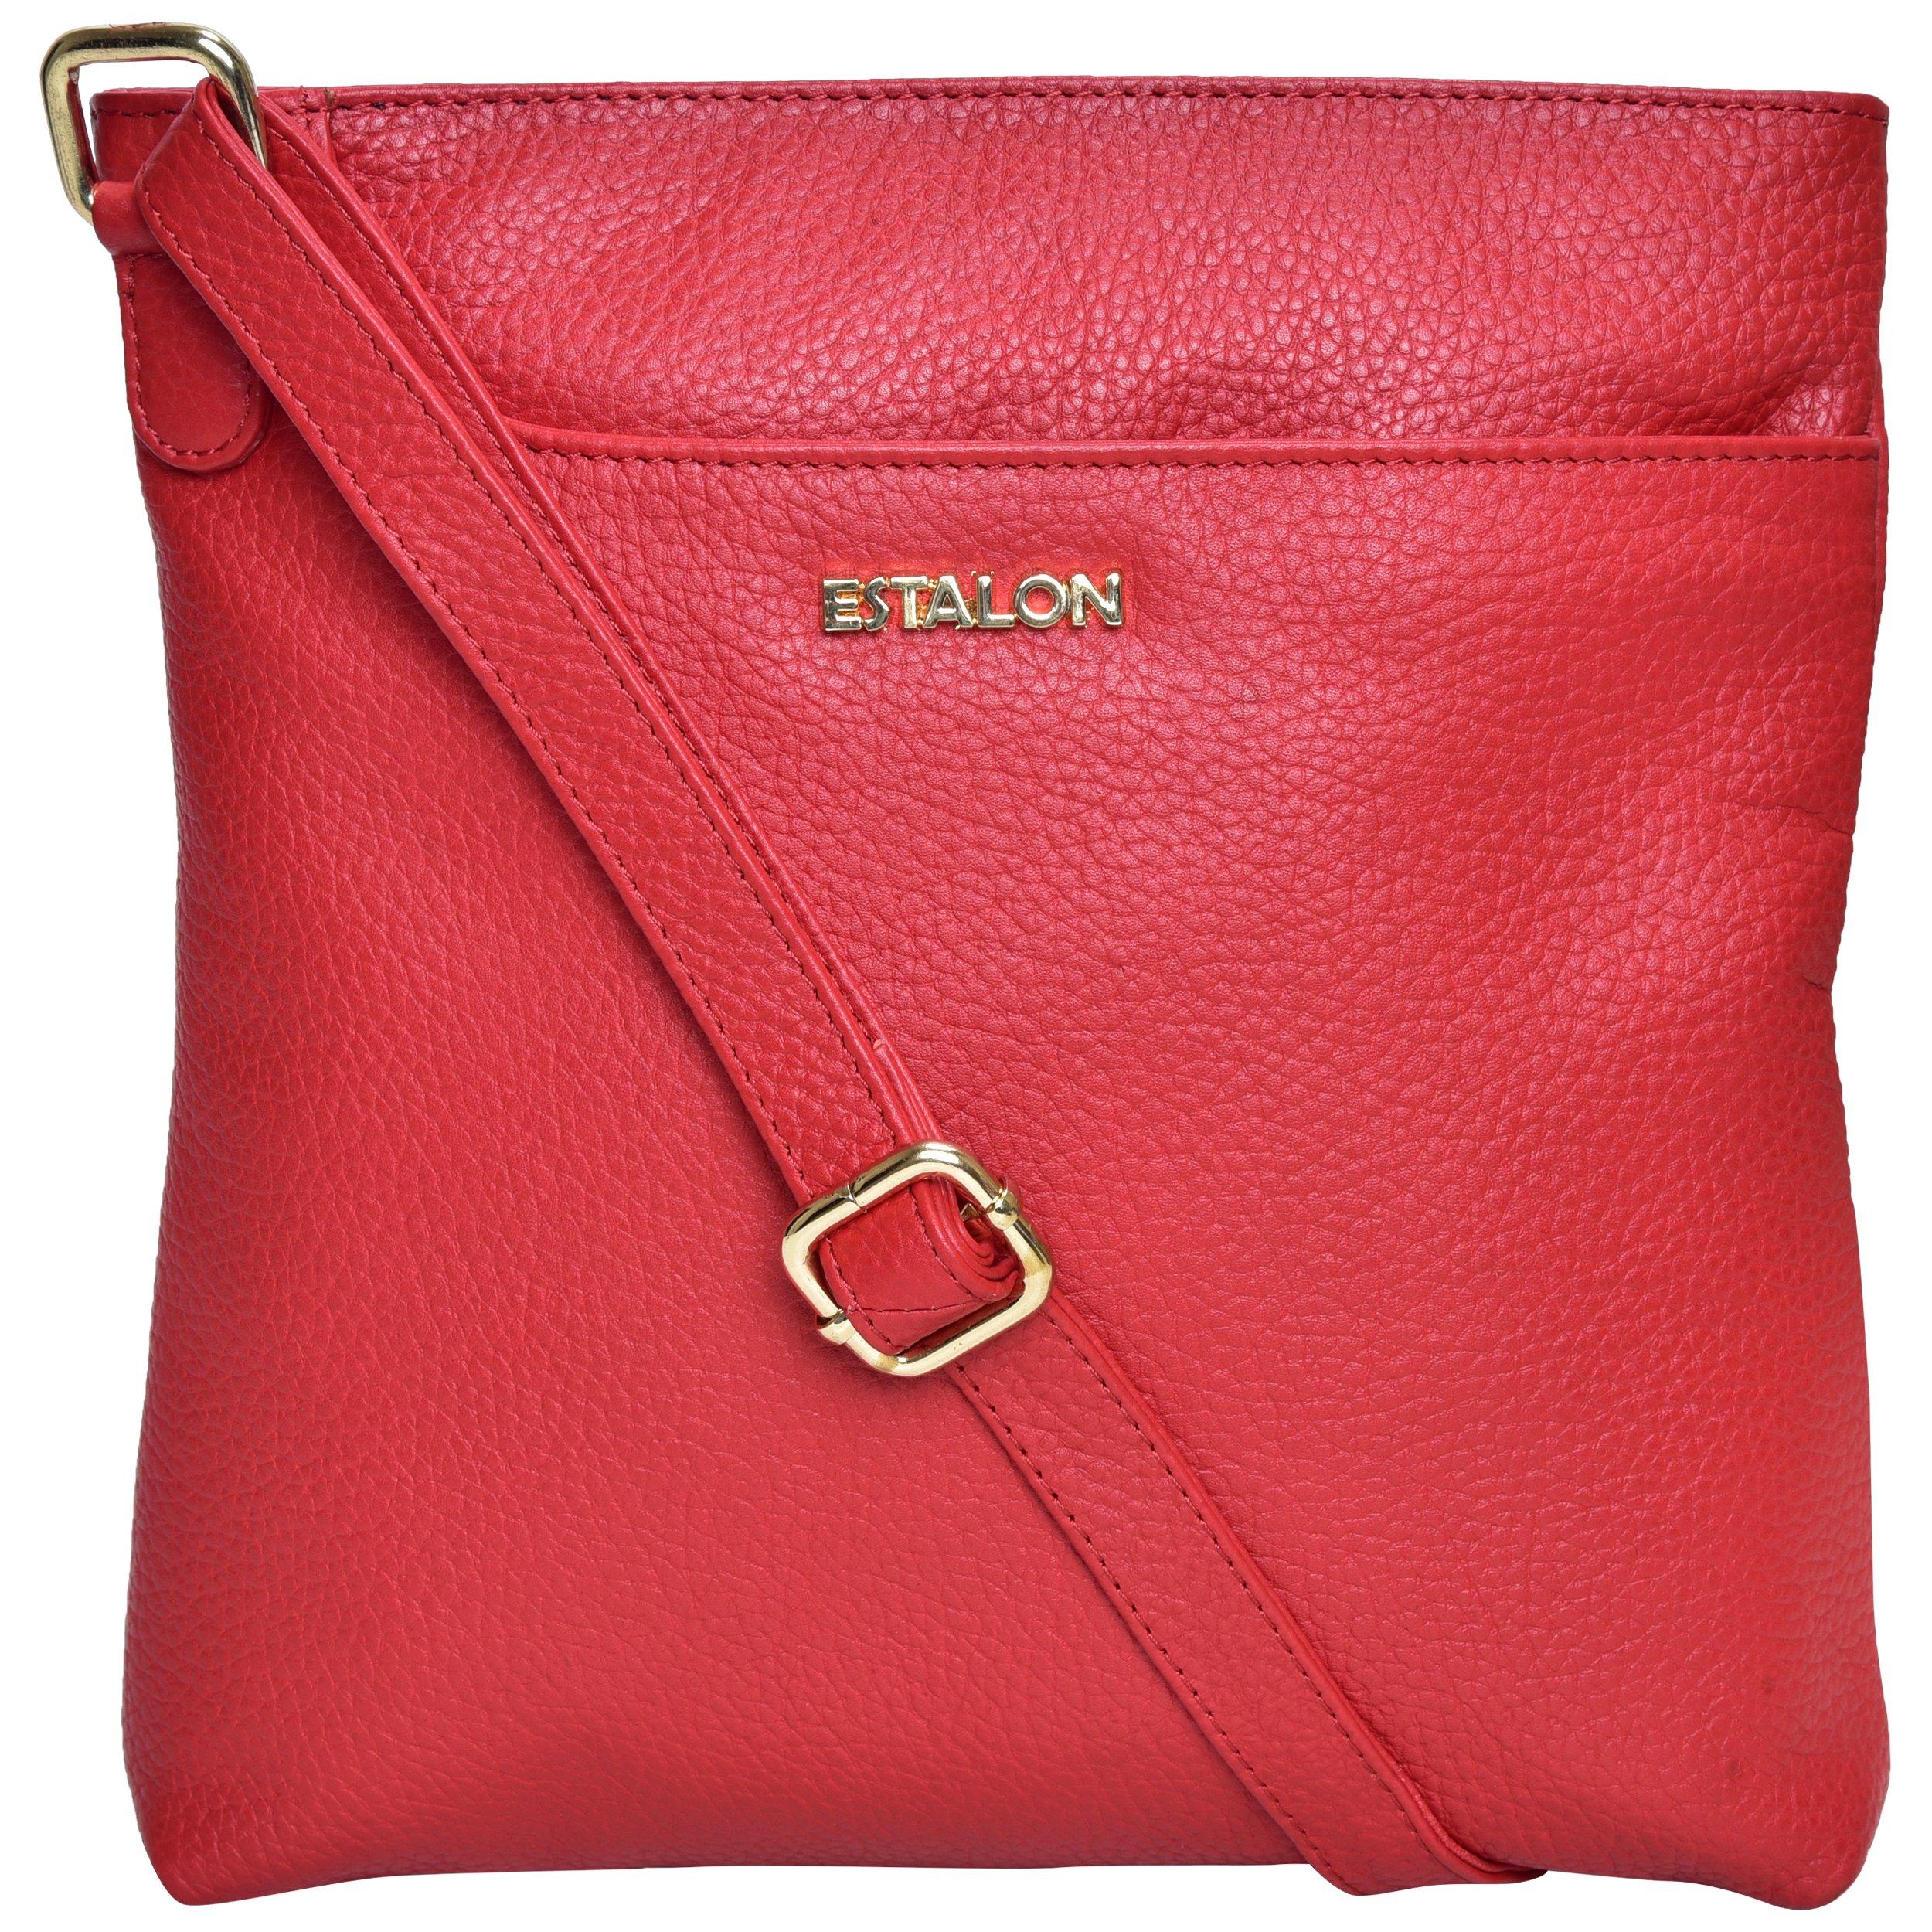 Premium Leather Crossbody Slim Bag for Women - Handmade Cross Body Over the Shoulder Purse Luxury Womens (Red Pebble)